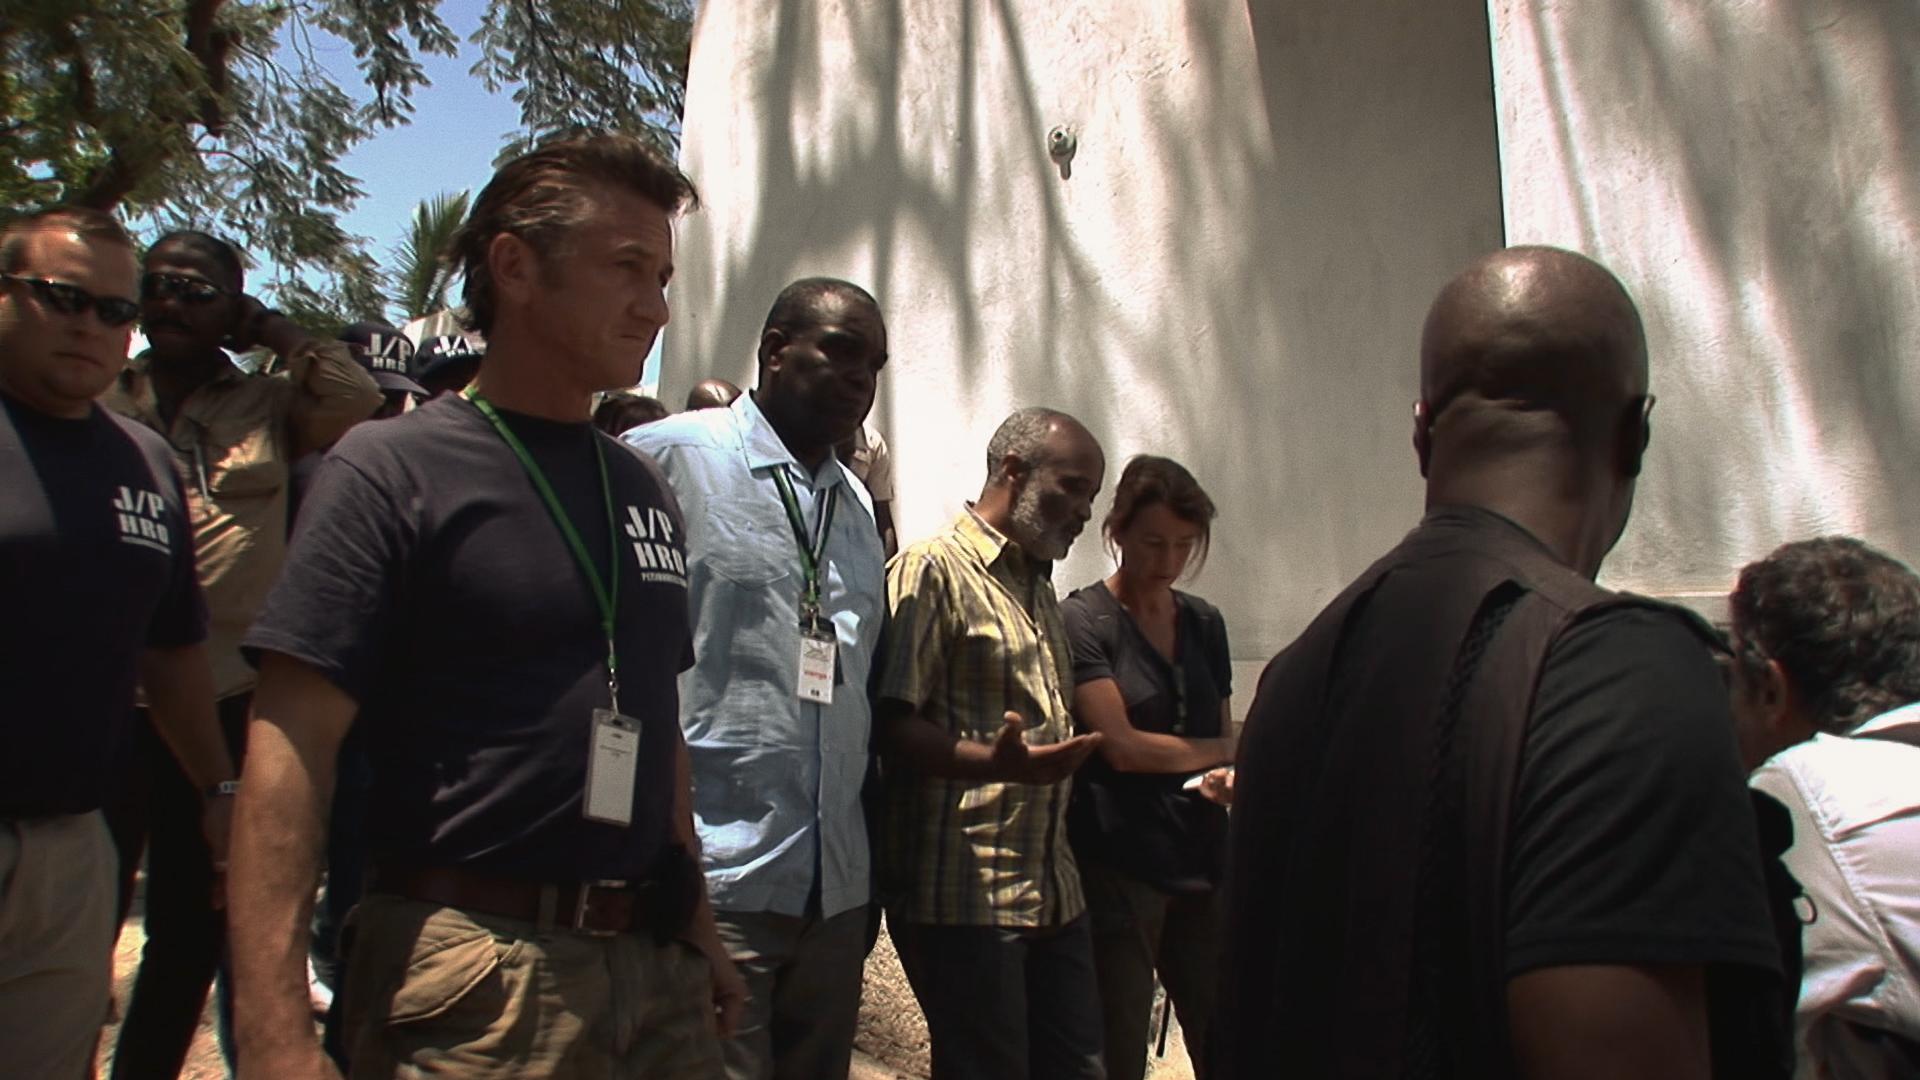 Sean Penn with former president of Haiti